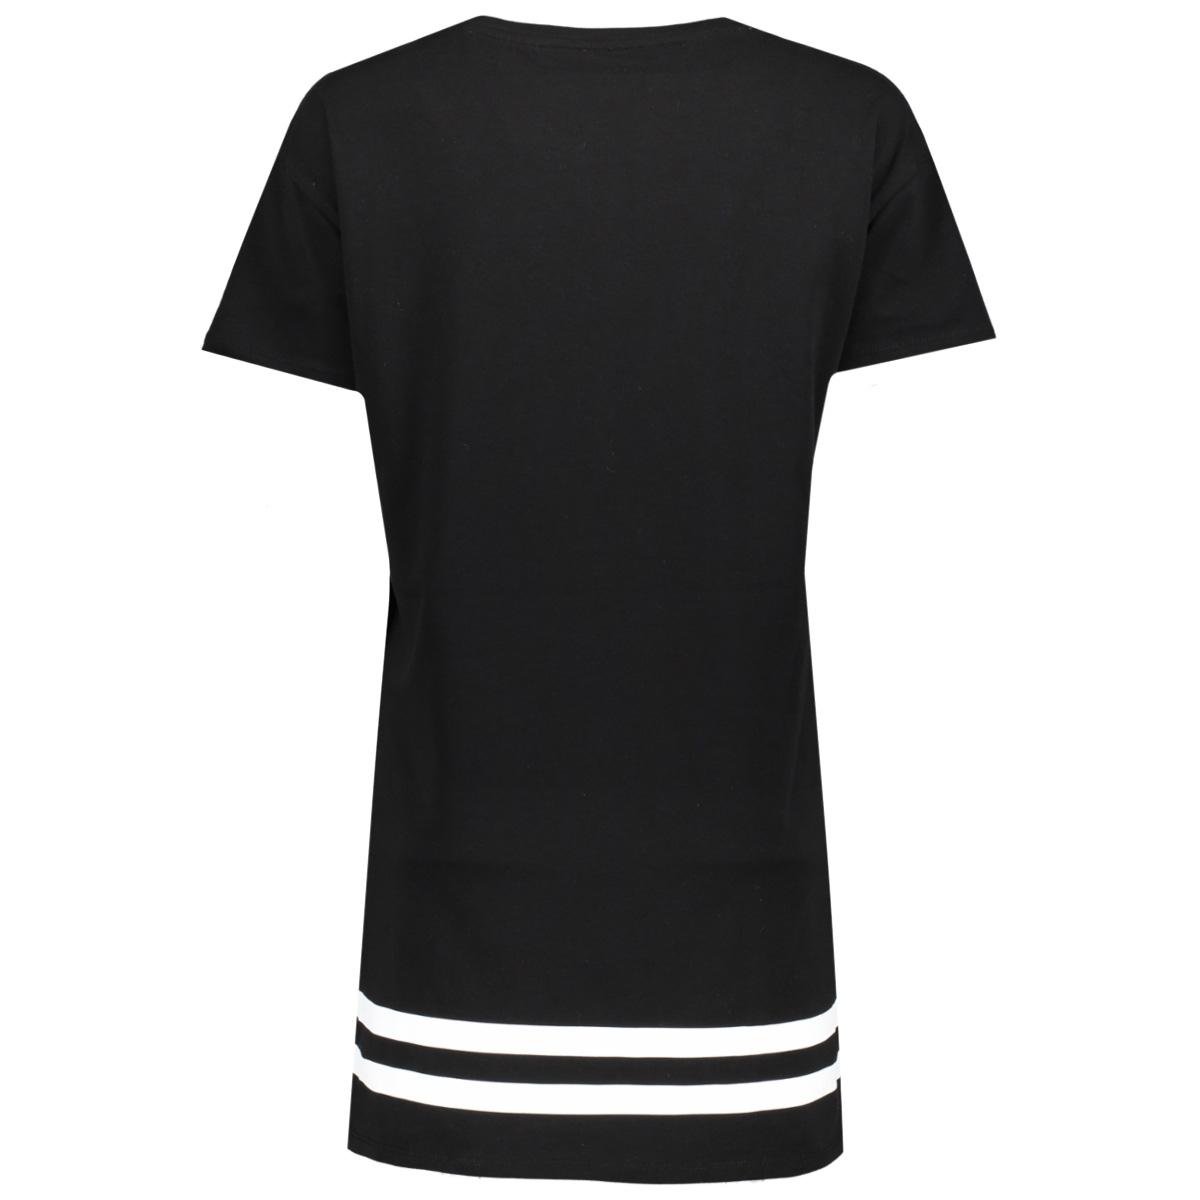 onlsquad brooklyn s/s short dress b 15144595 only t-shirt black